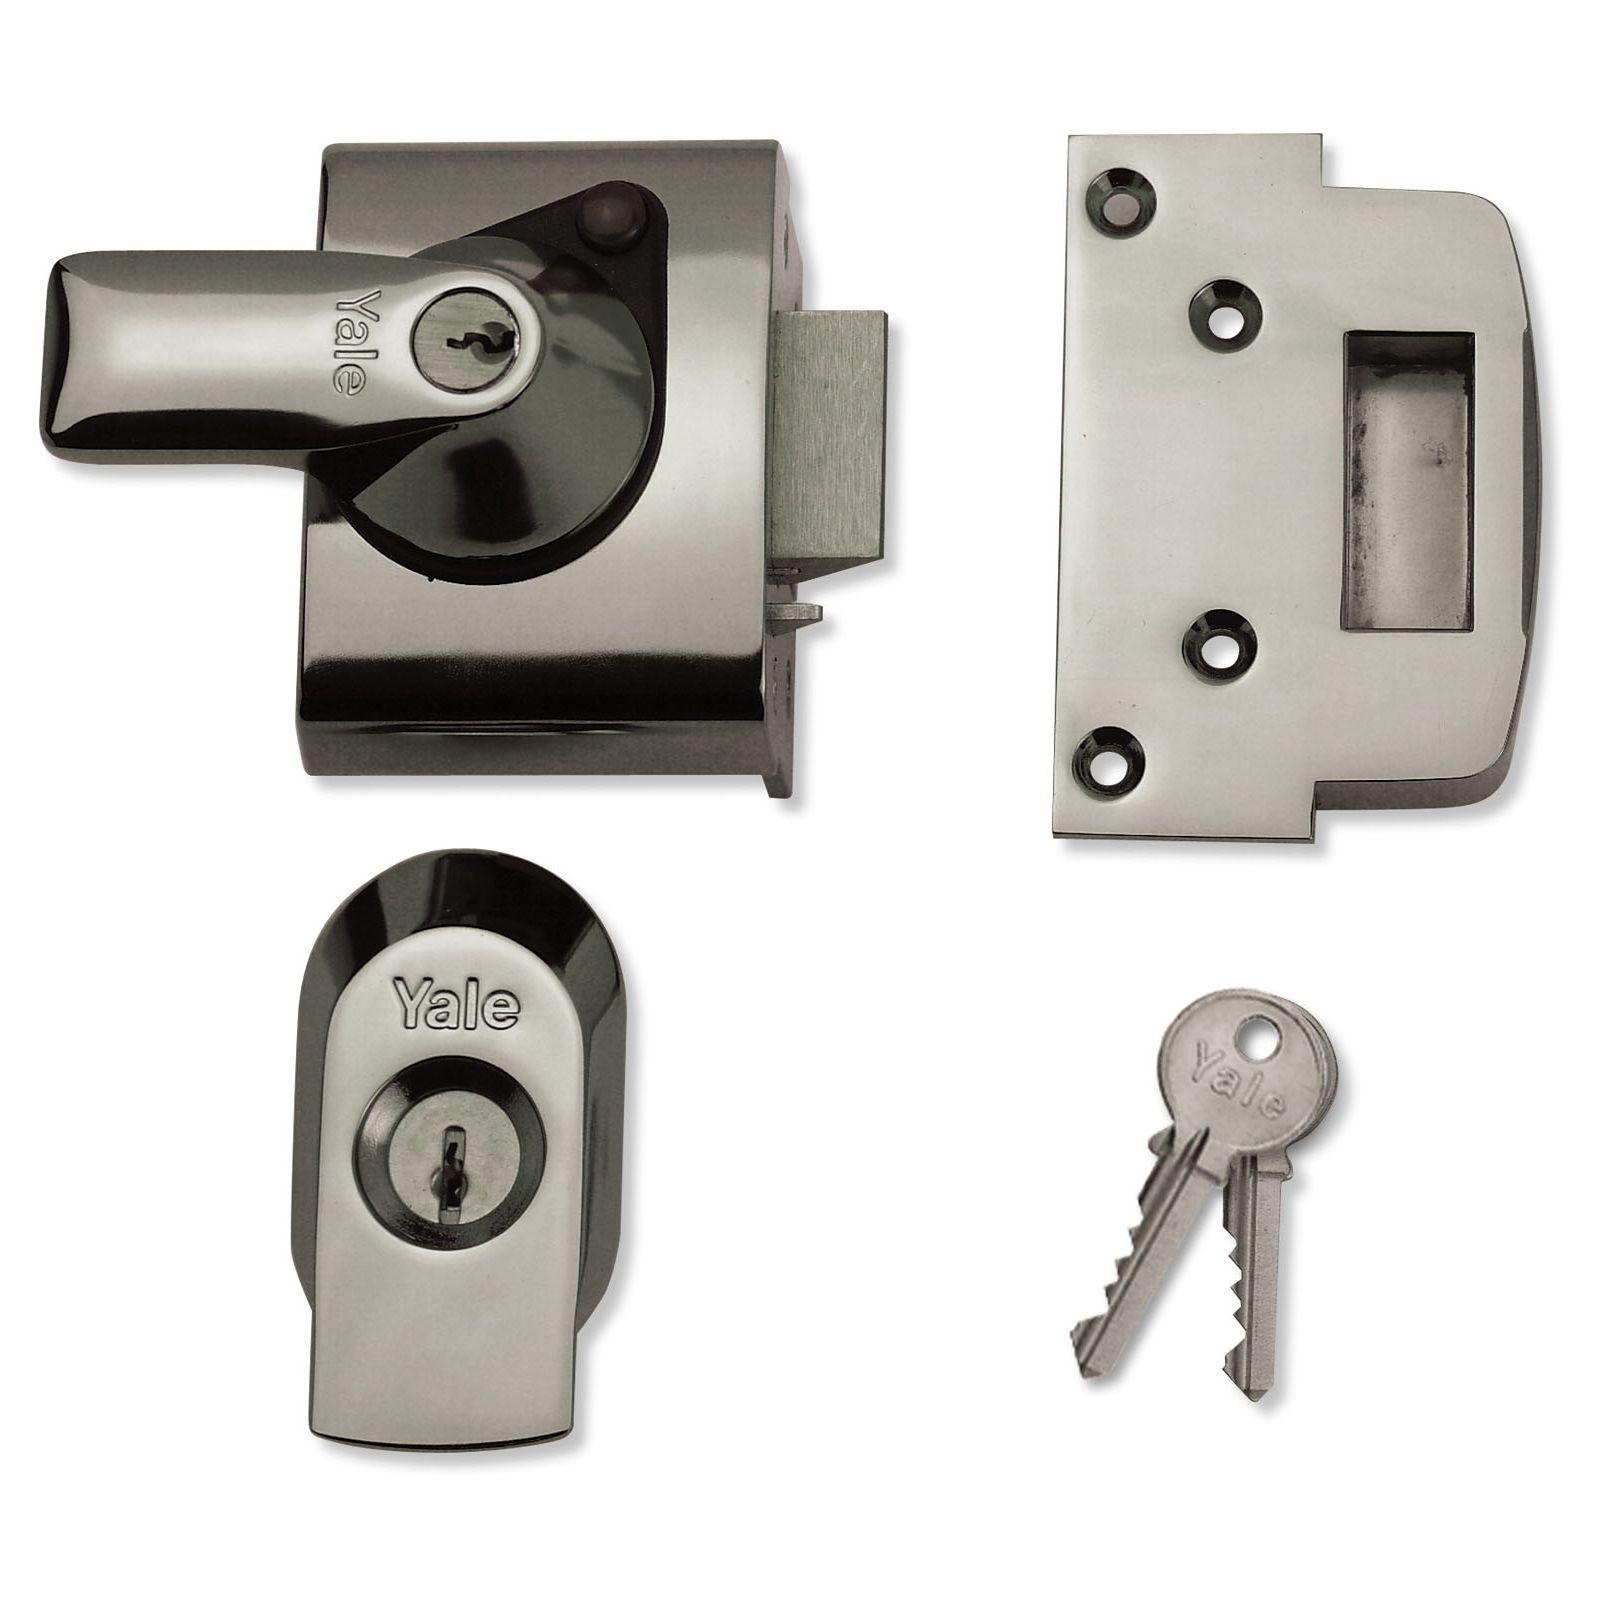 Yale BS2 British Standard Nightlatch 40mm or 60mm - Chrome for £21.90 @ Homebase (+10 years guarantee)